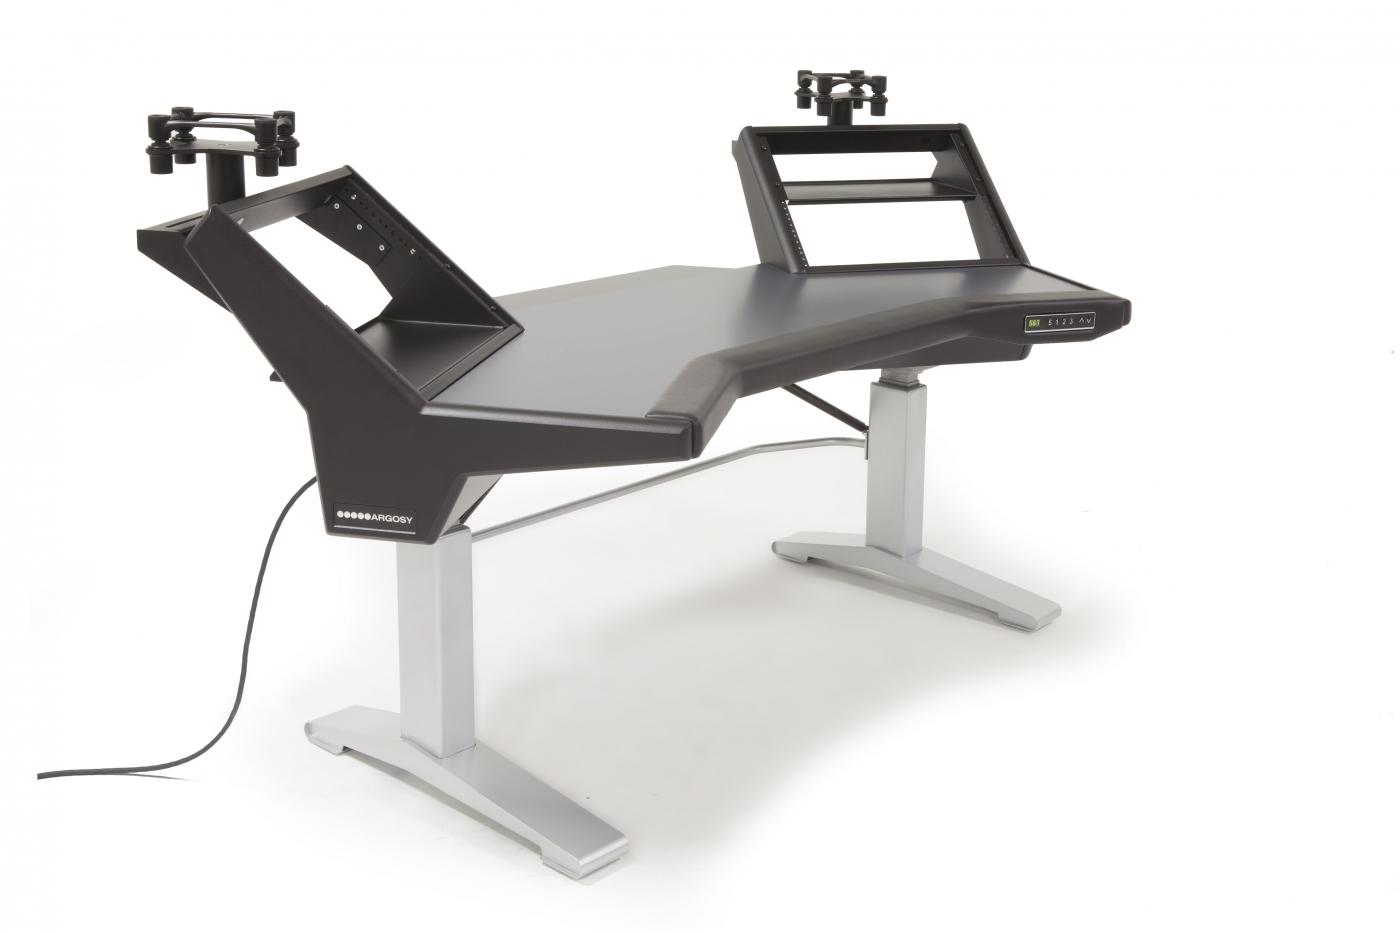 Argosy Halo E L H B S Halo E Plus Height Adjustable Sit